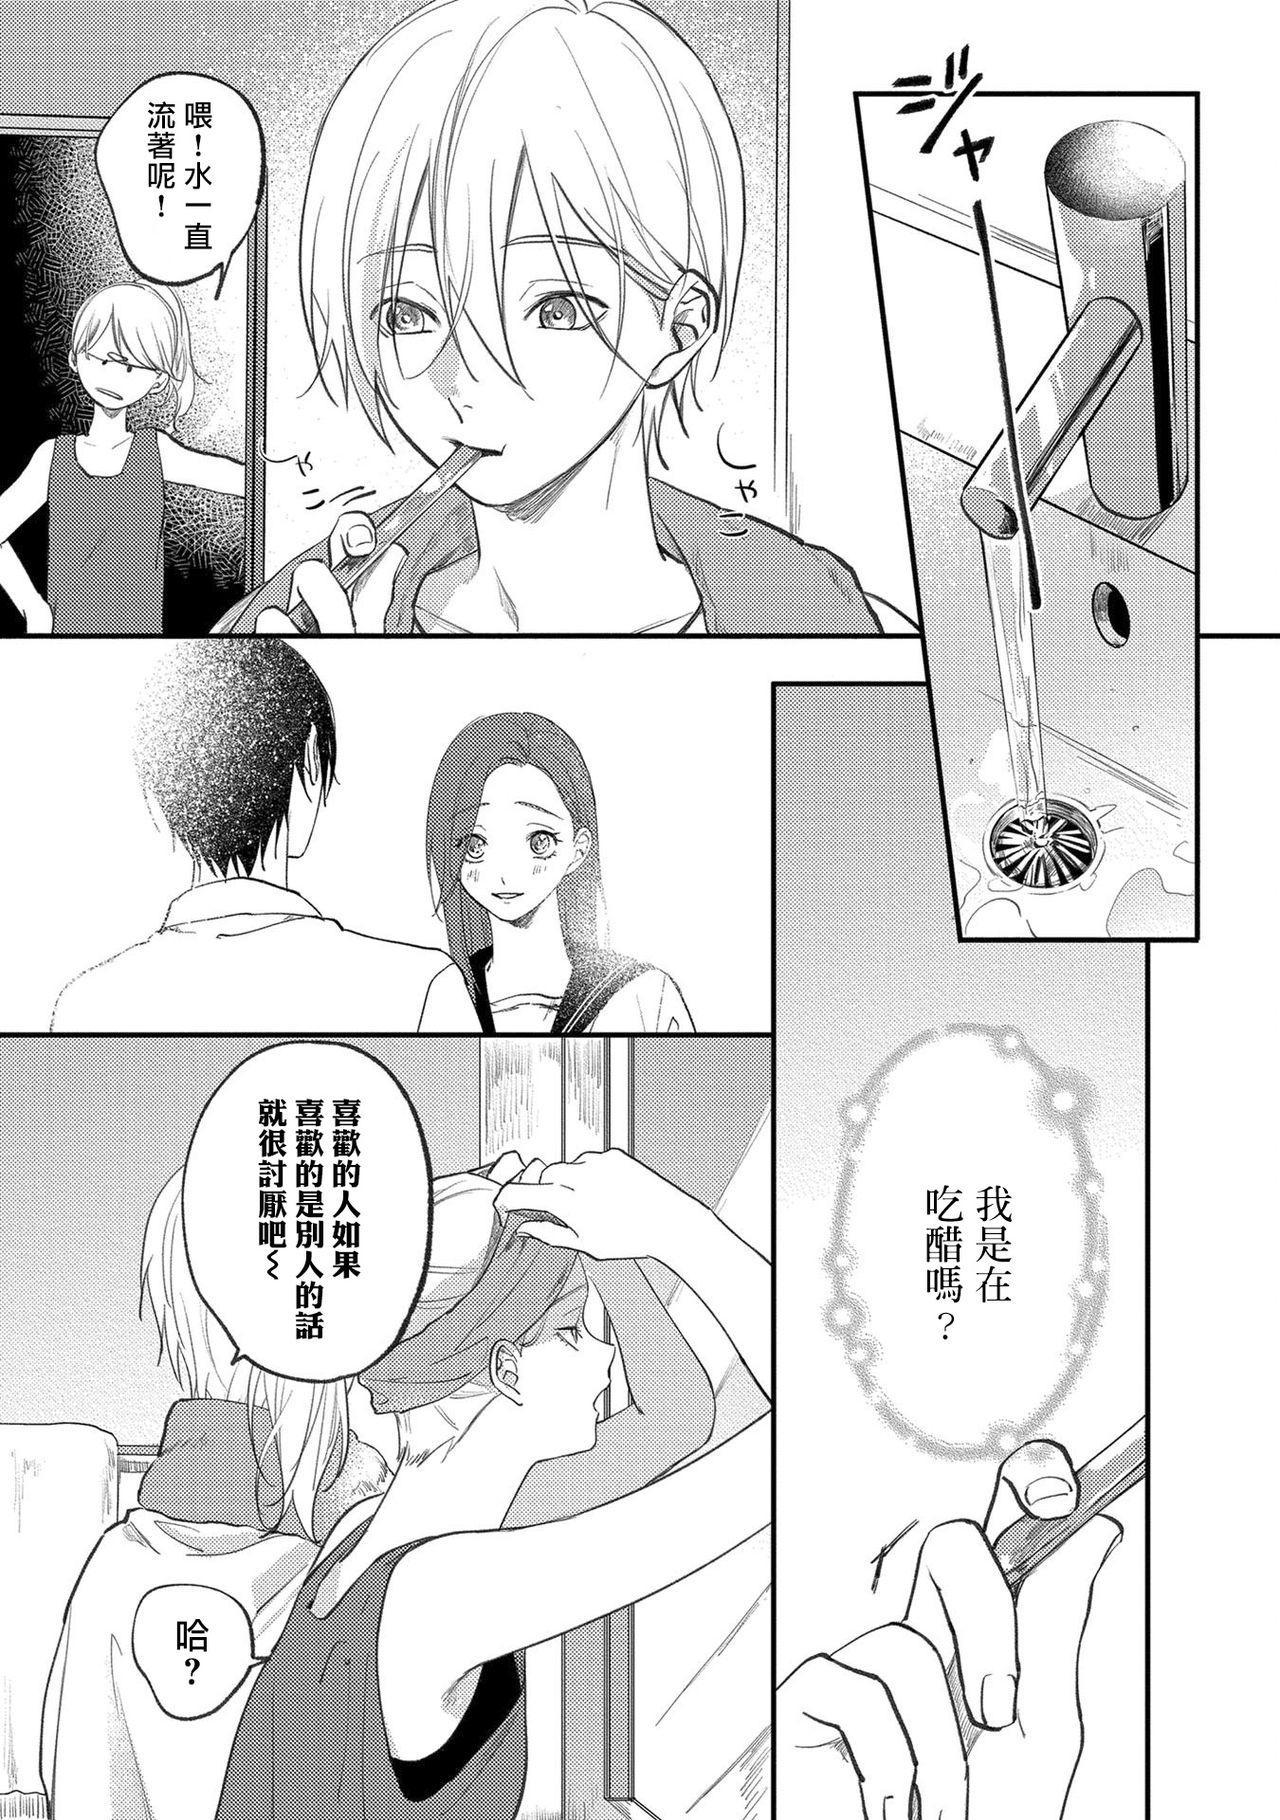 [Utata Hakuto] Houkago Virginity - Virginity afterschool 1-5 完结 [Chinese] [拾荒者汉化组] [Digital] 136